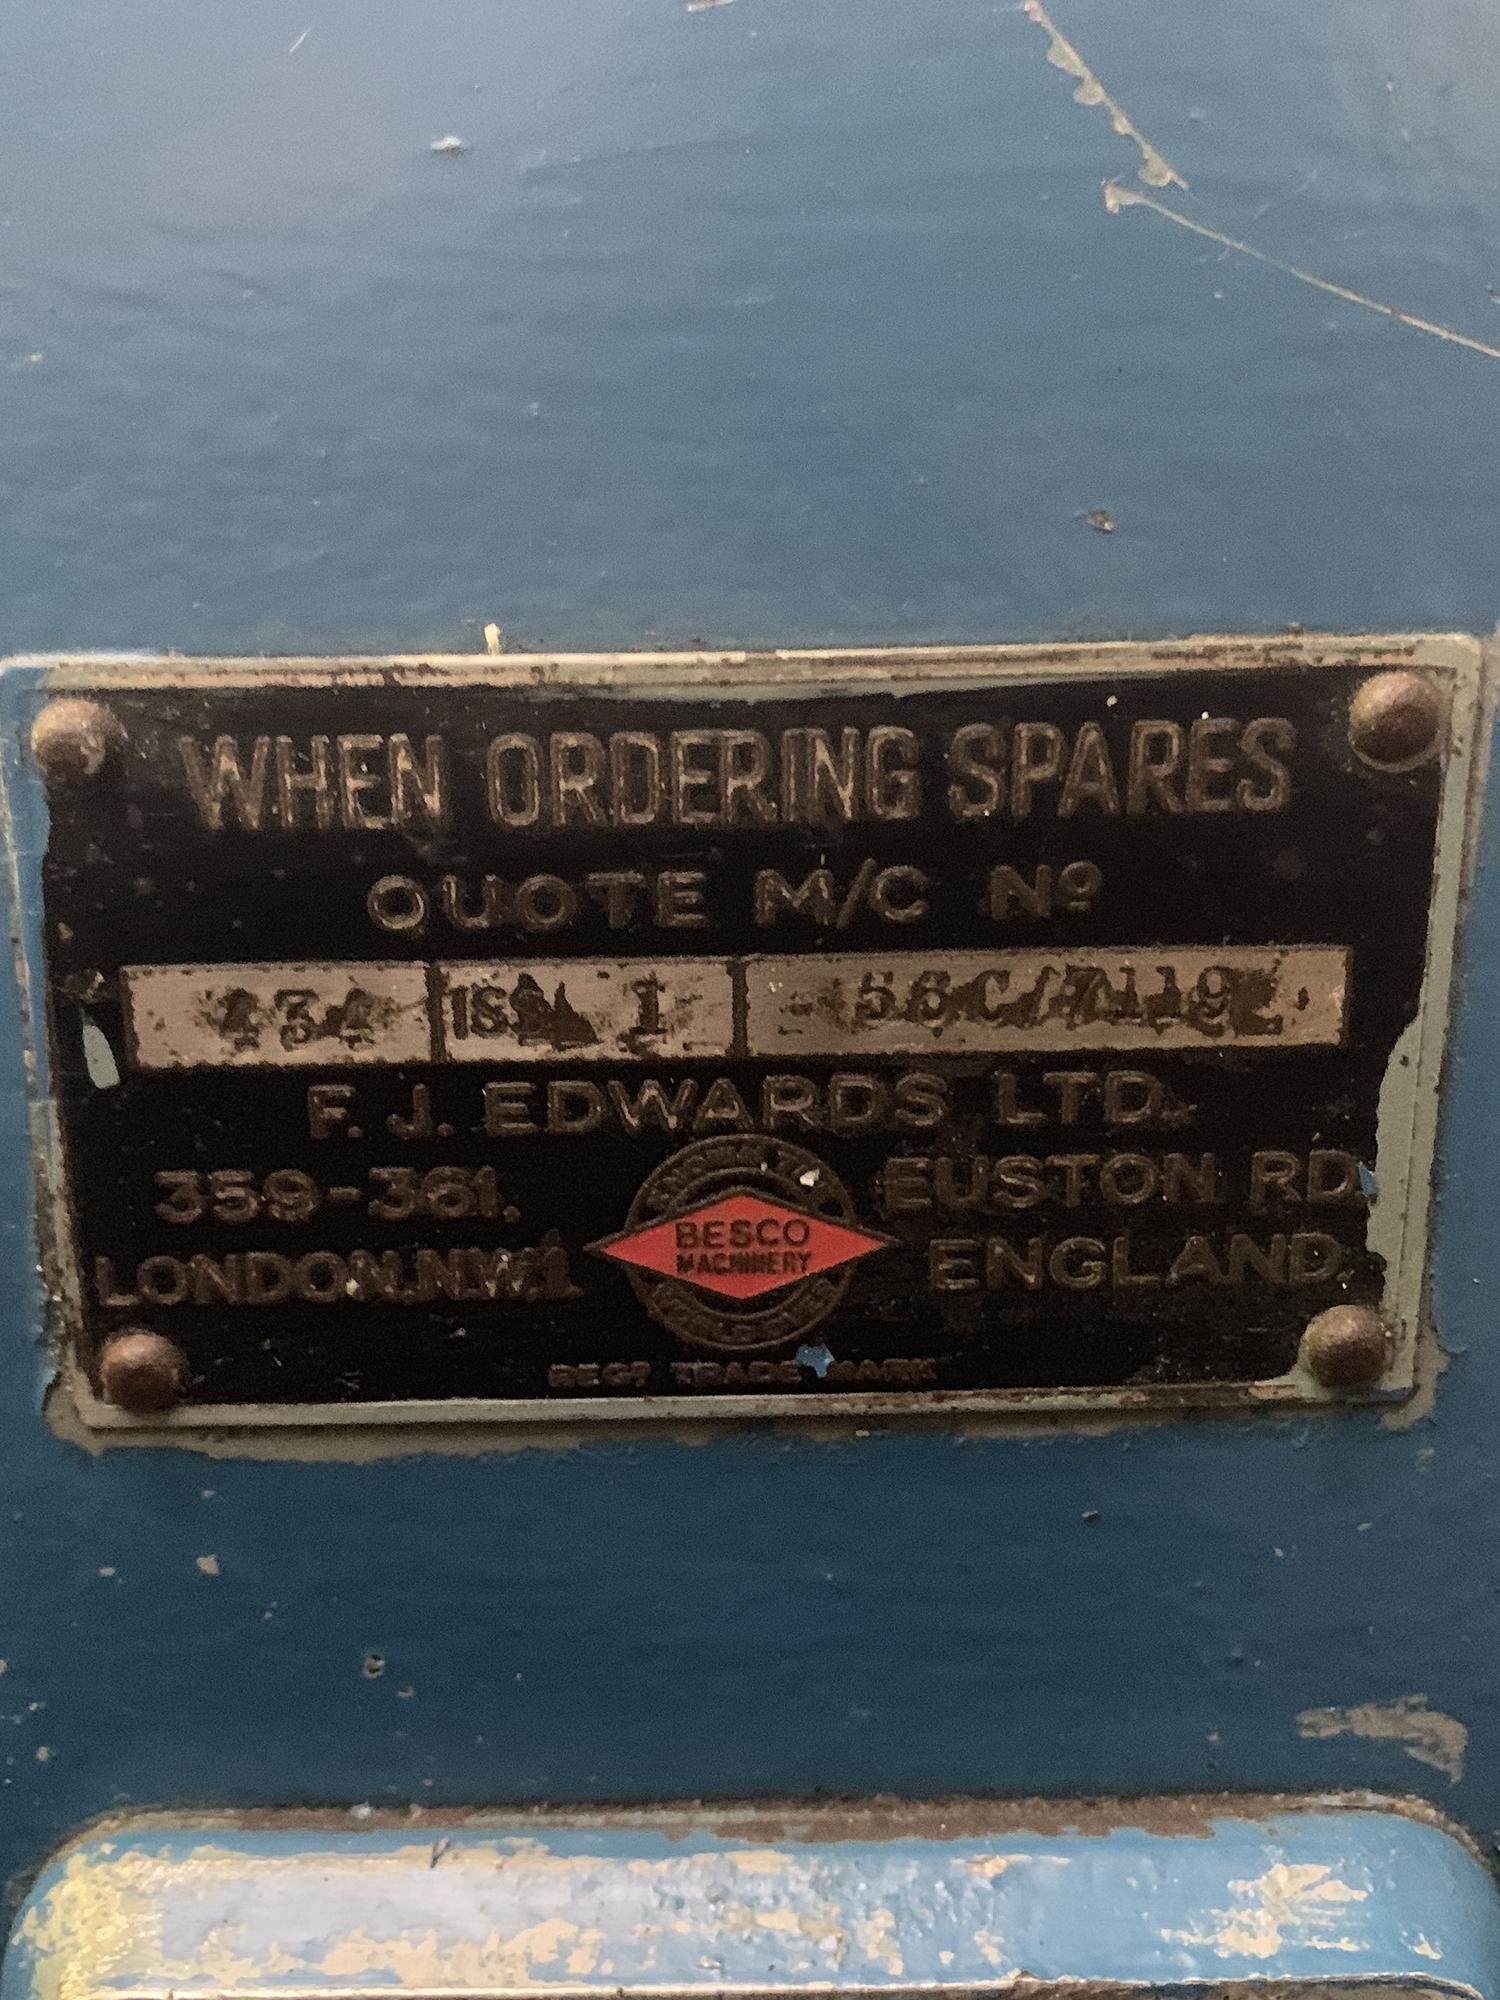 FJ Edwards Seam Closing Machine. Capacity 36''. - Image 5 of 5